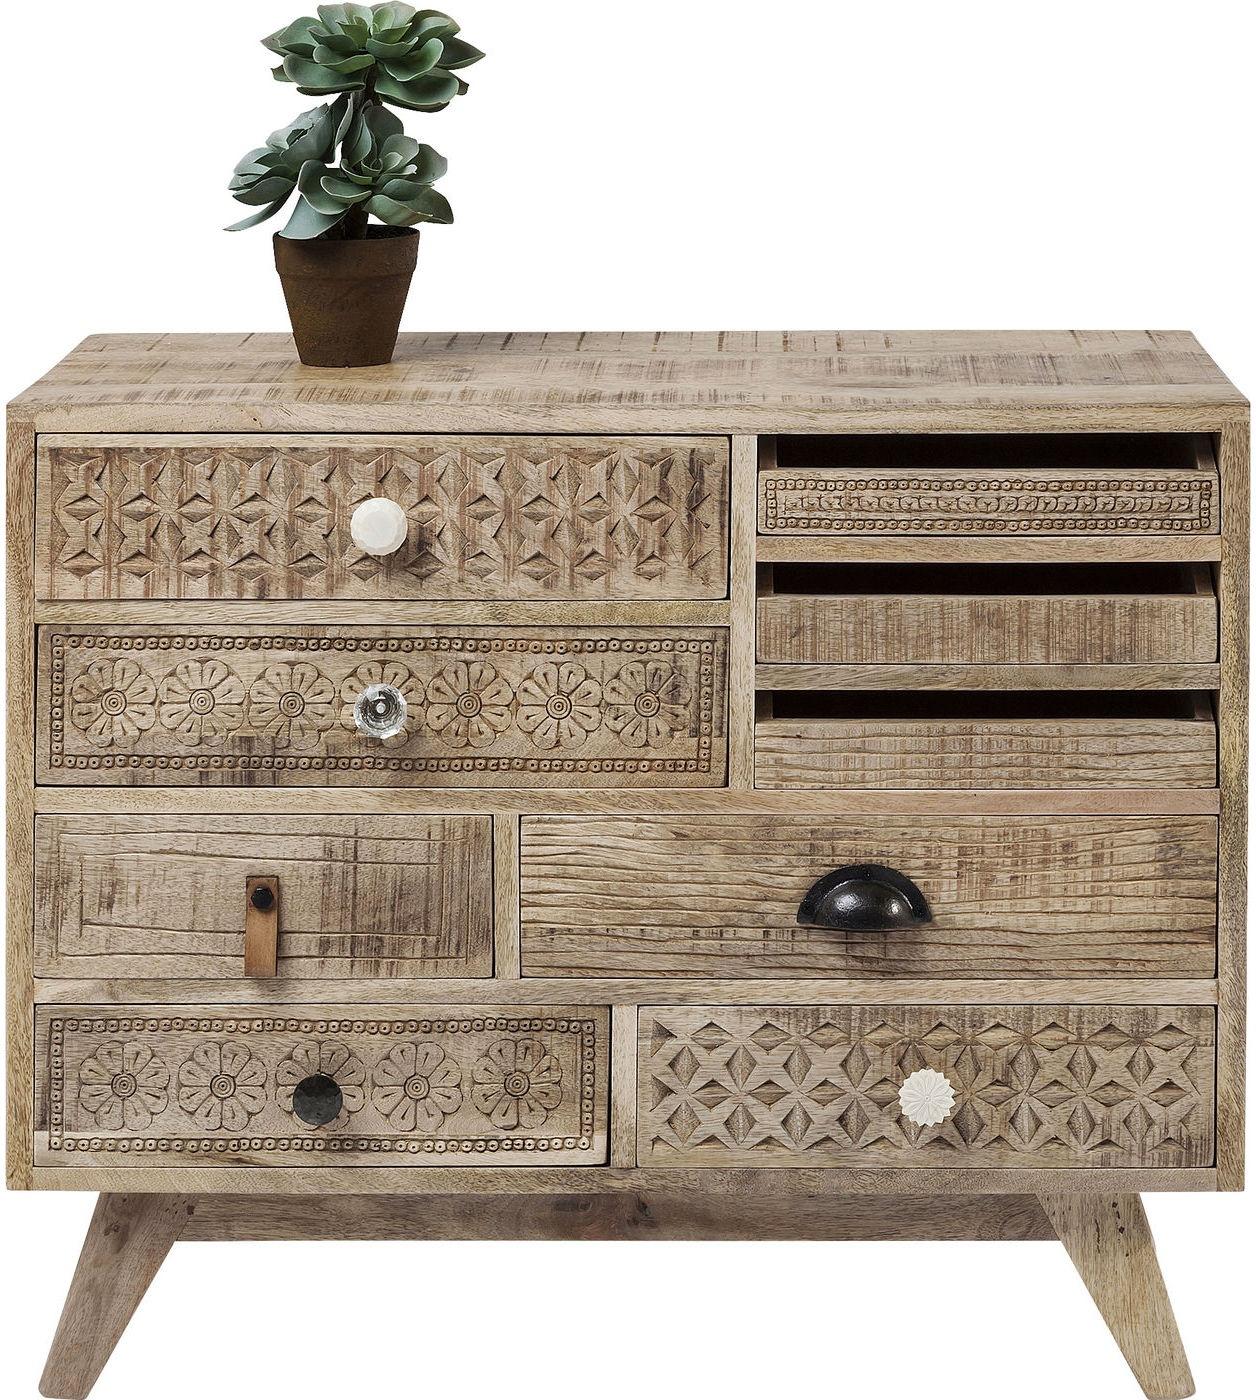 Kare Design Ladekast Puro 9 Laden - 80x35x65 - Mangohout